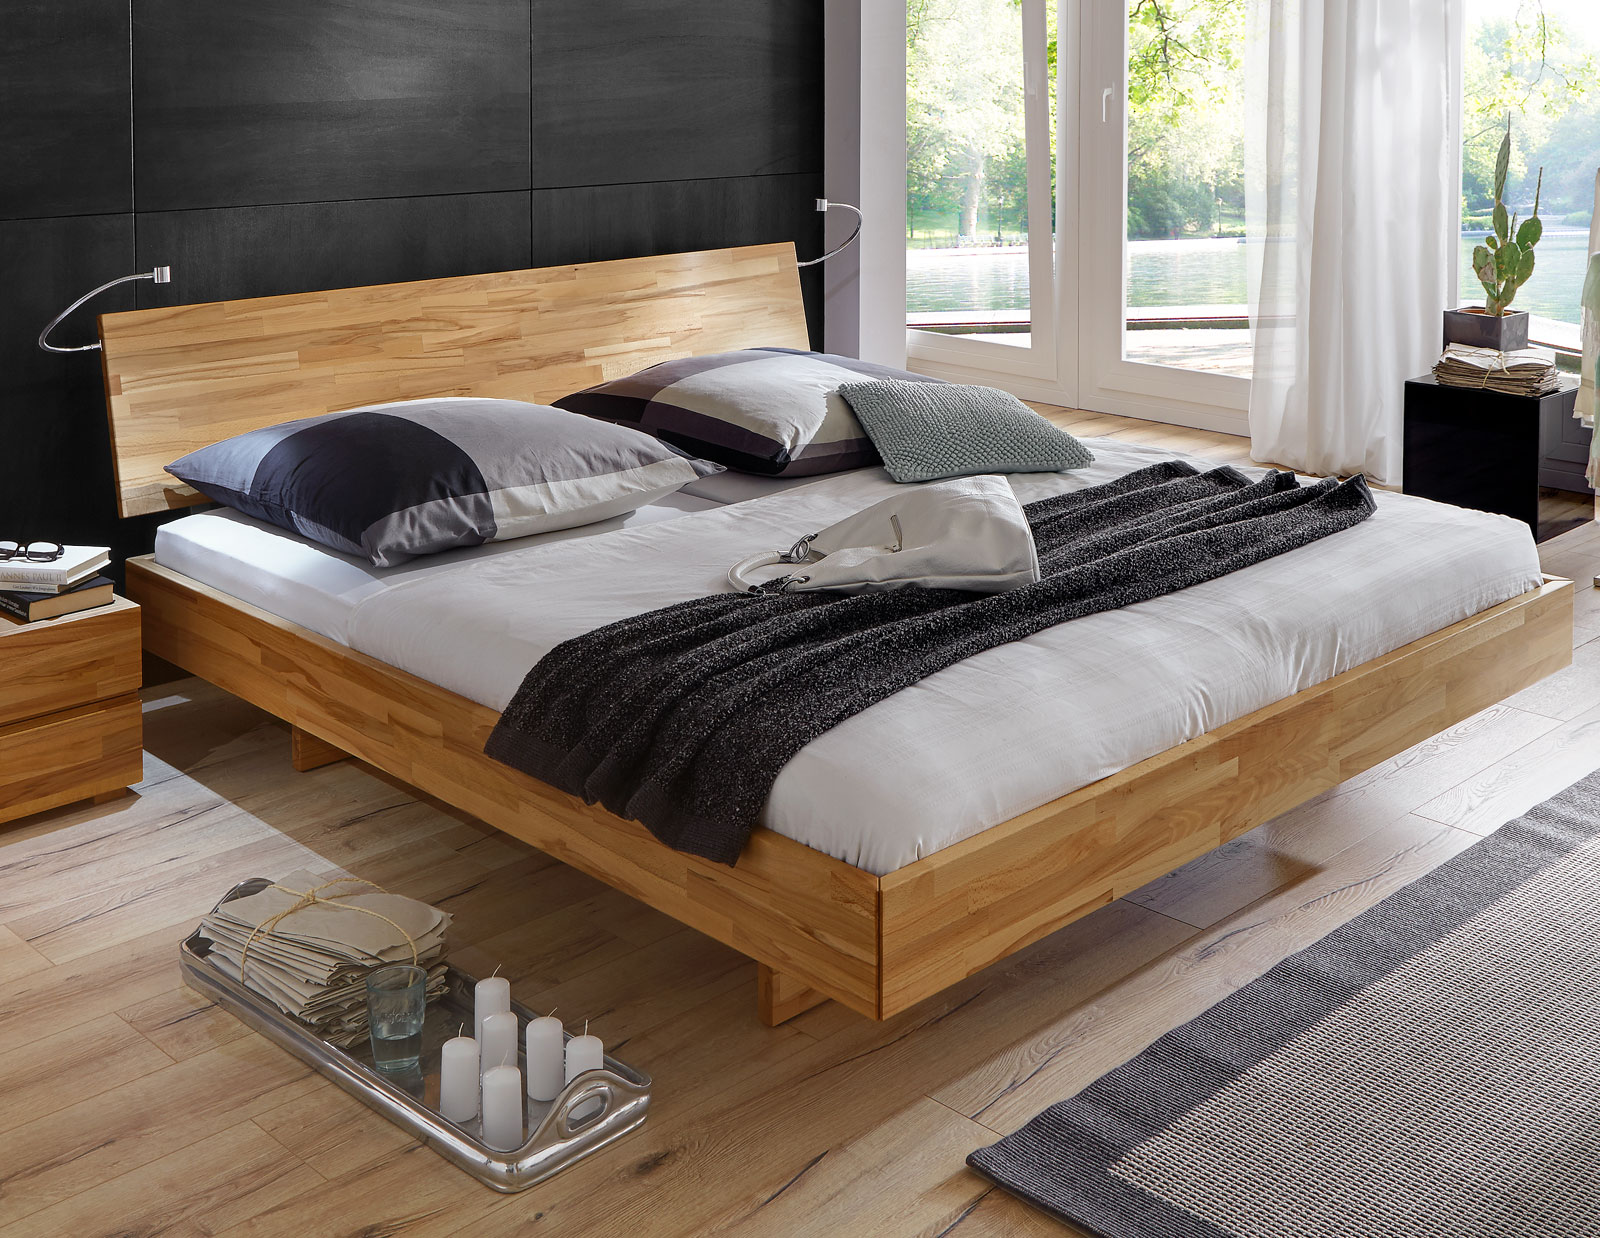 bequemes bett rimini aus hochwertigem buchenholz. Black Bedroom Furniture Sets. Home Design Ideas